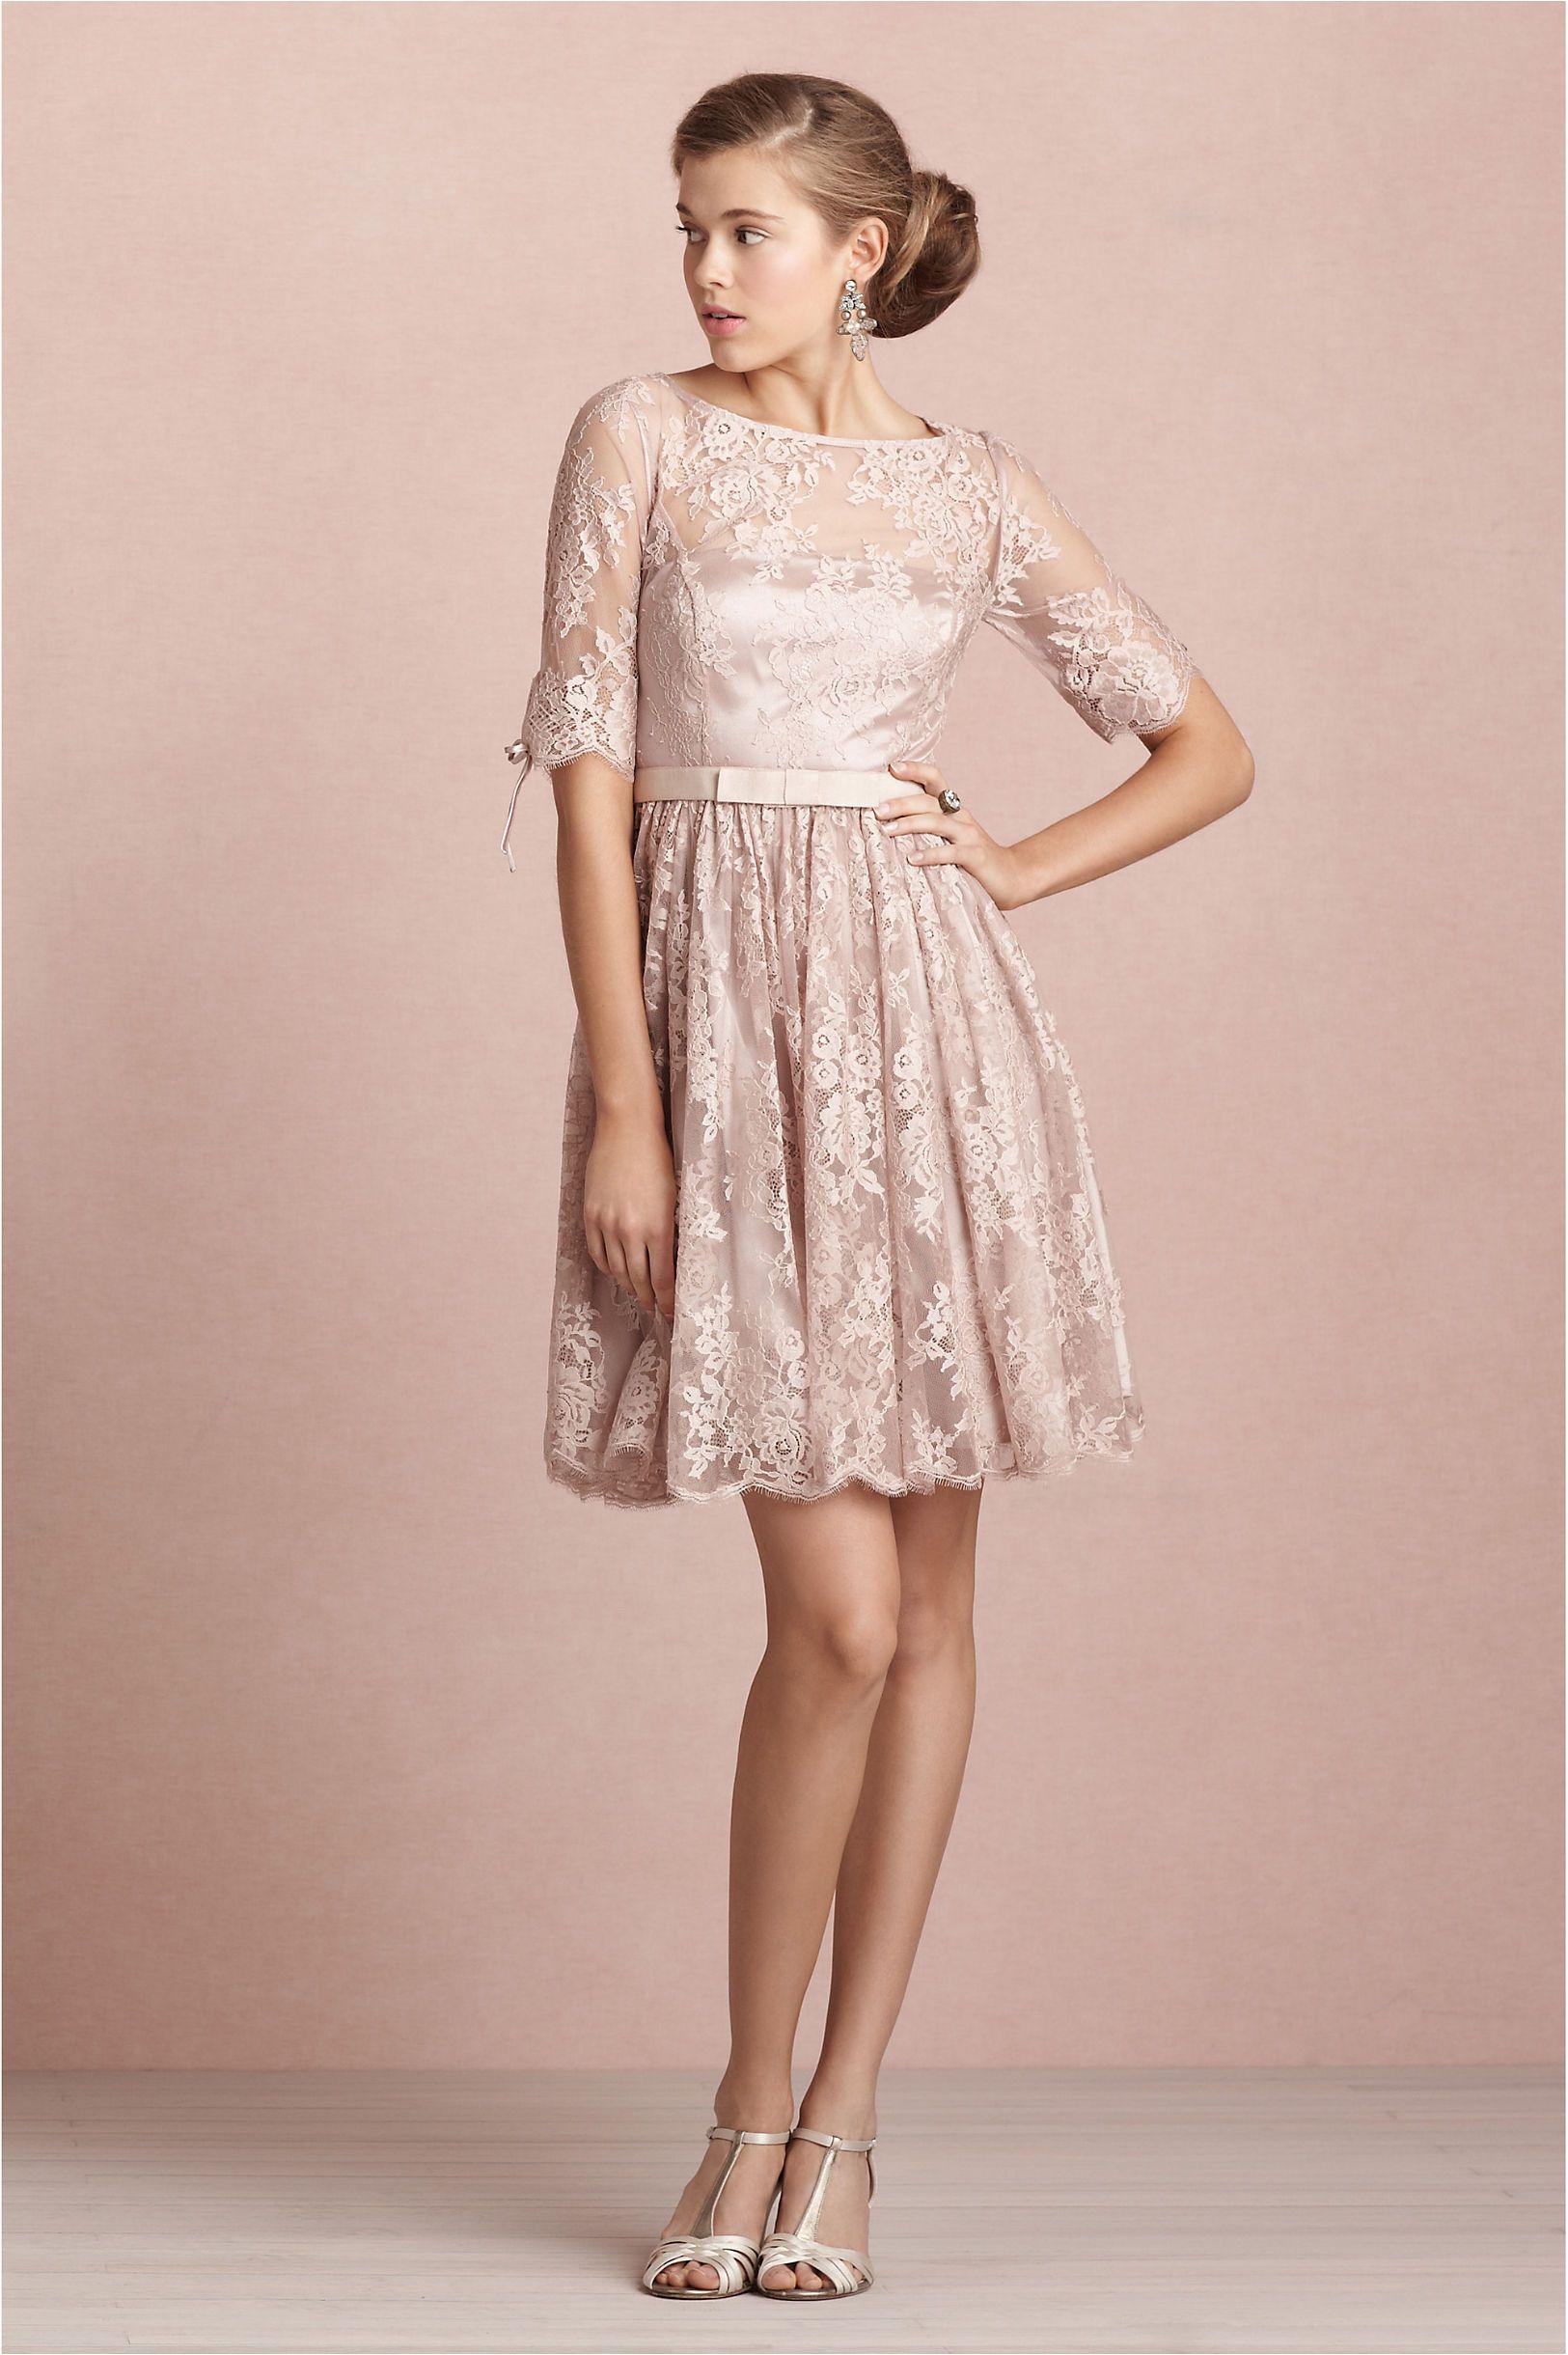 Tea Rose Dress in SHOP The Bride Reception Dresses at BHLDN